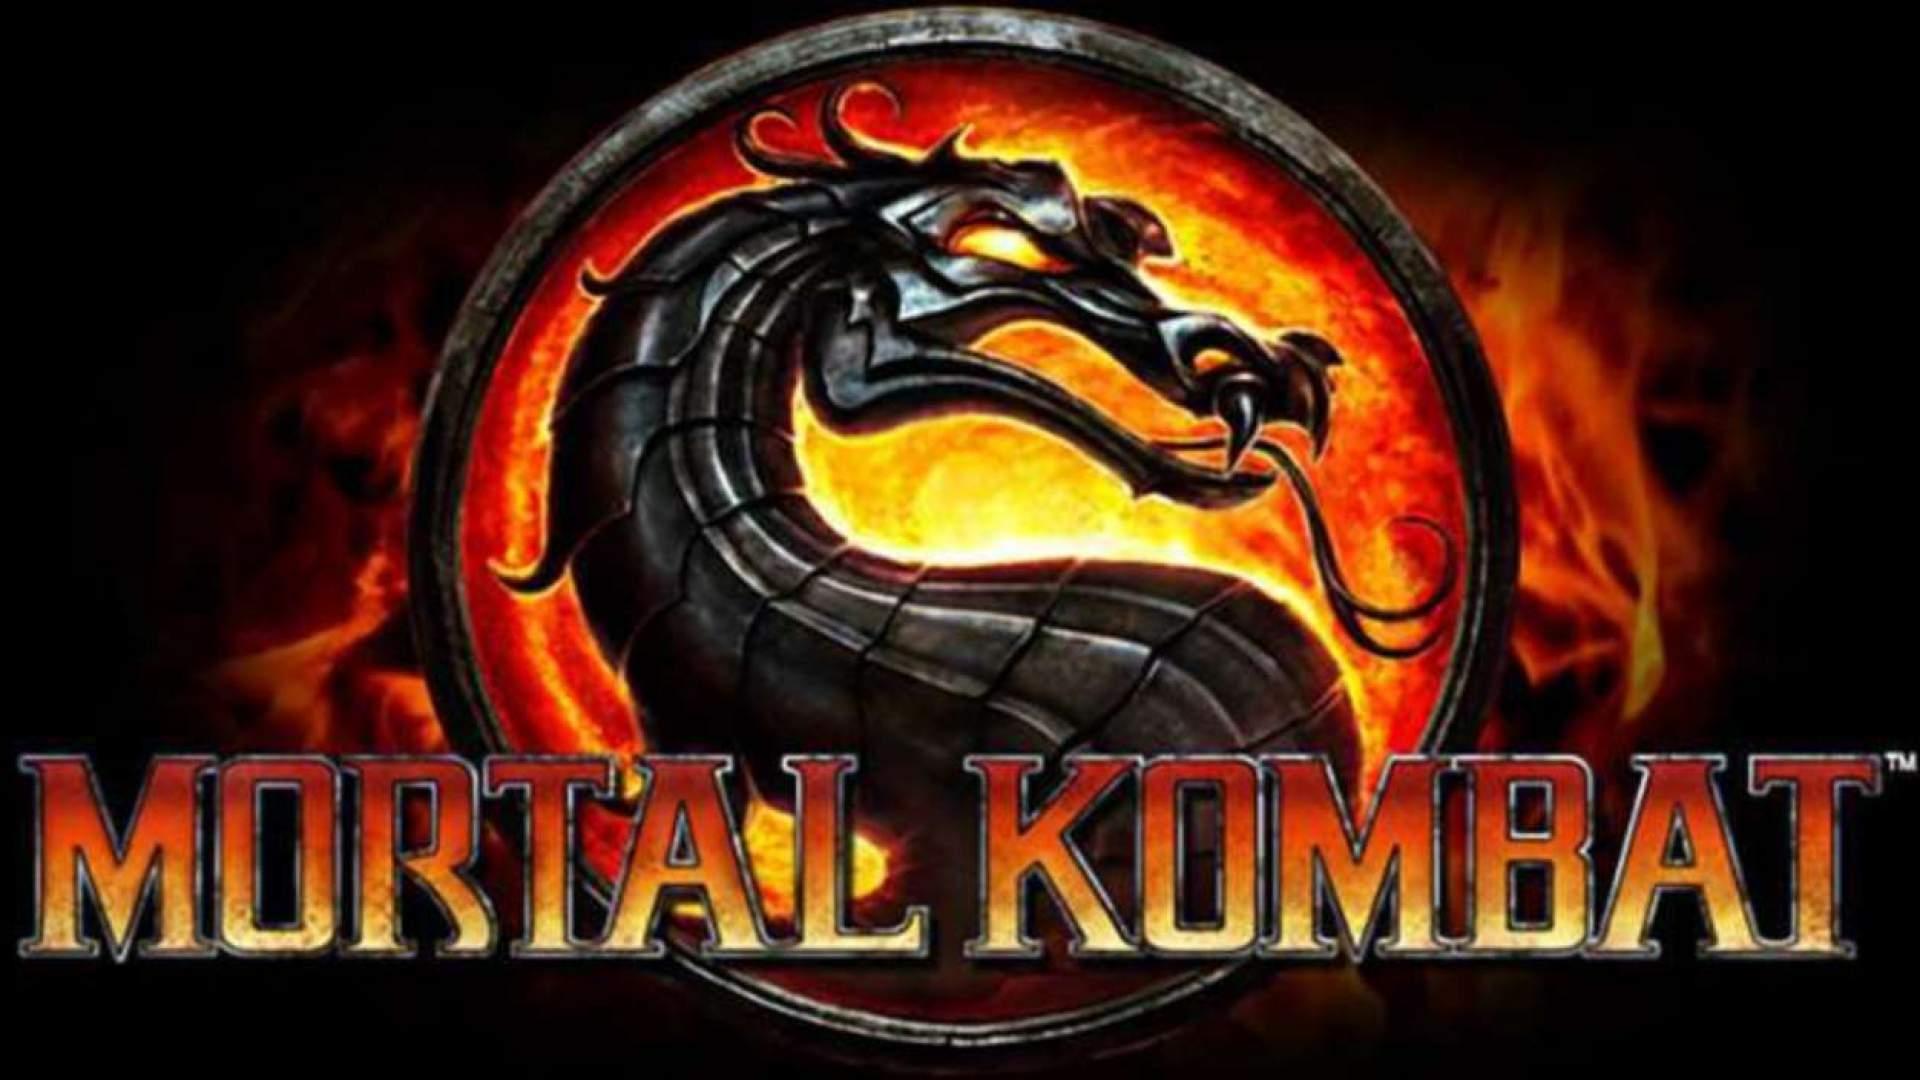 ENDLICH: 'Aquaman'-Macher kündigt neuen 'Mortal Kombat' Kinofilm an